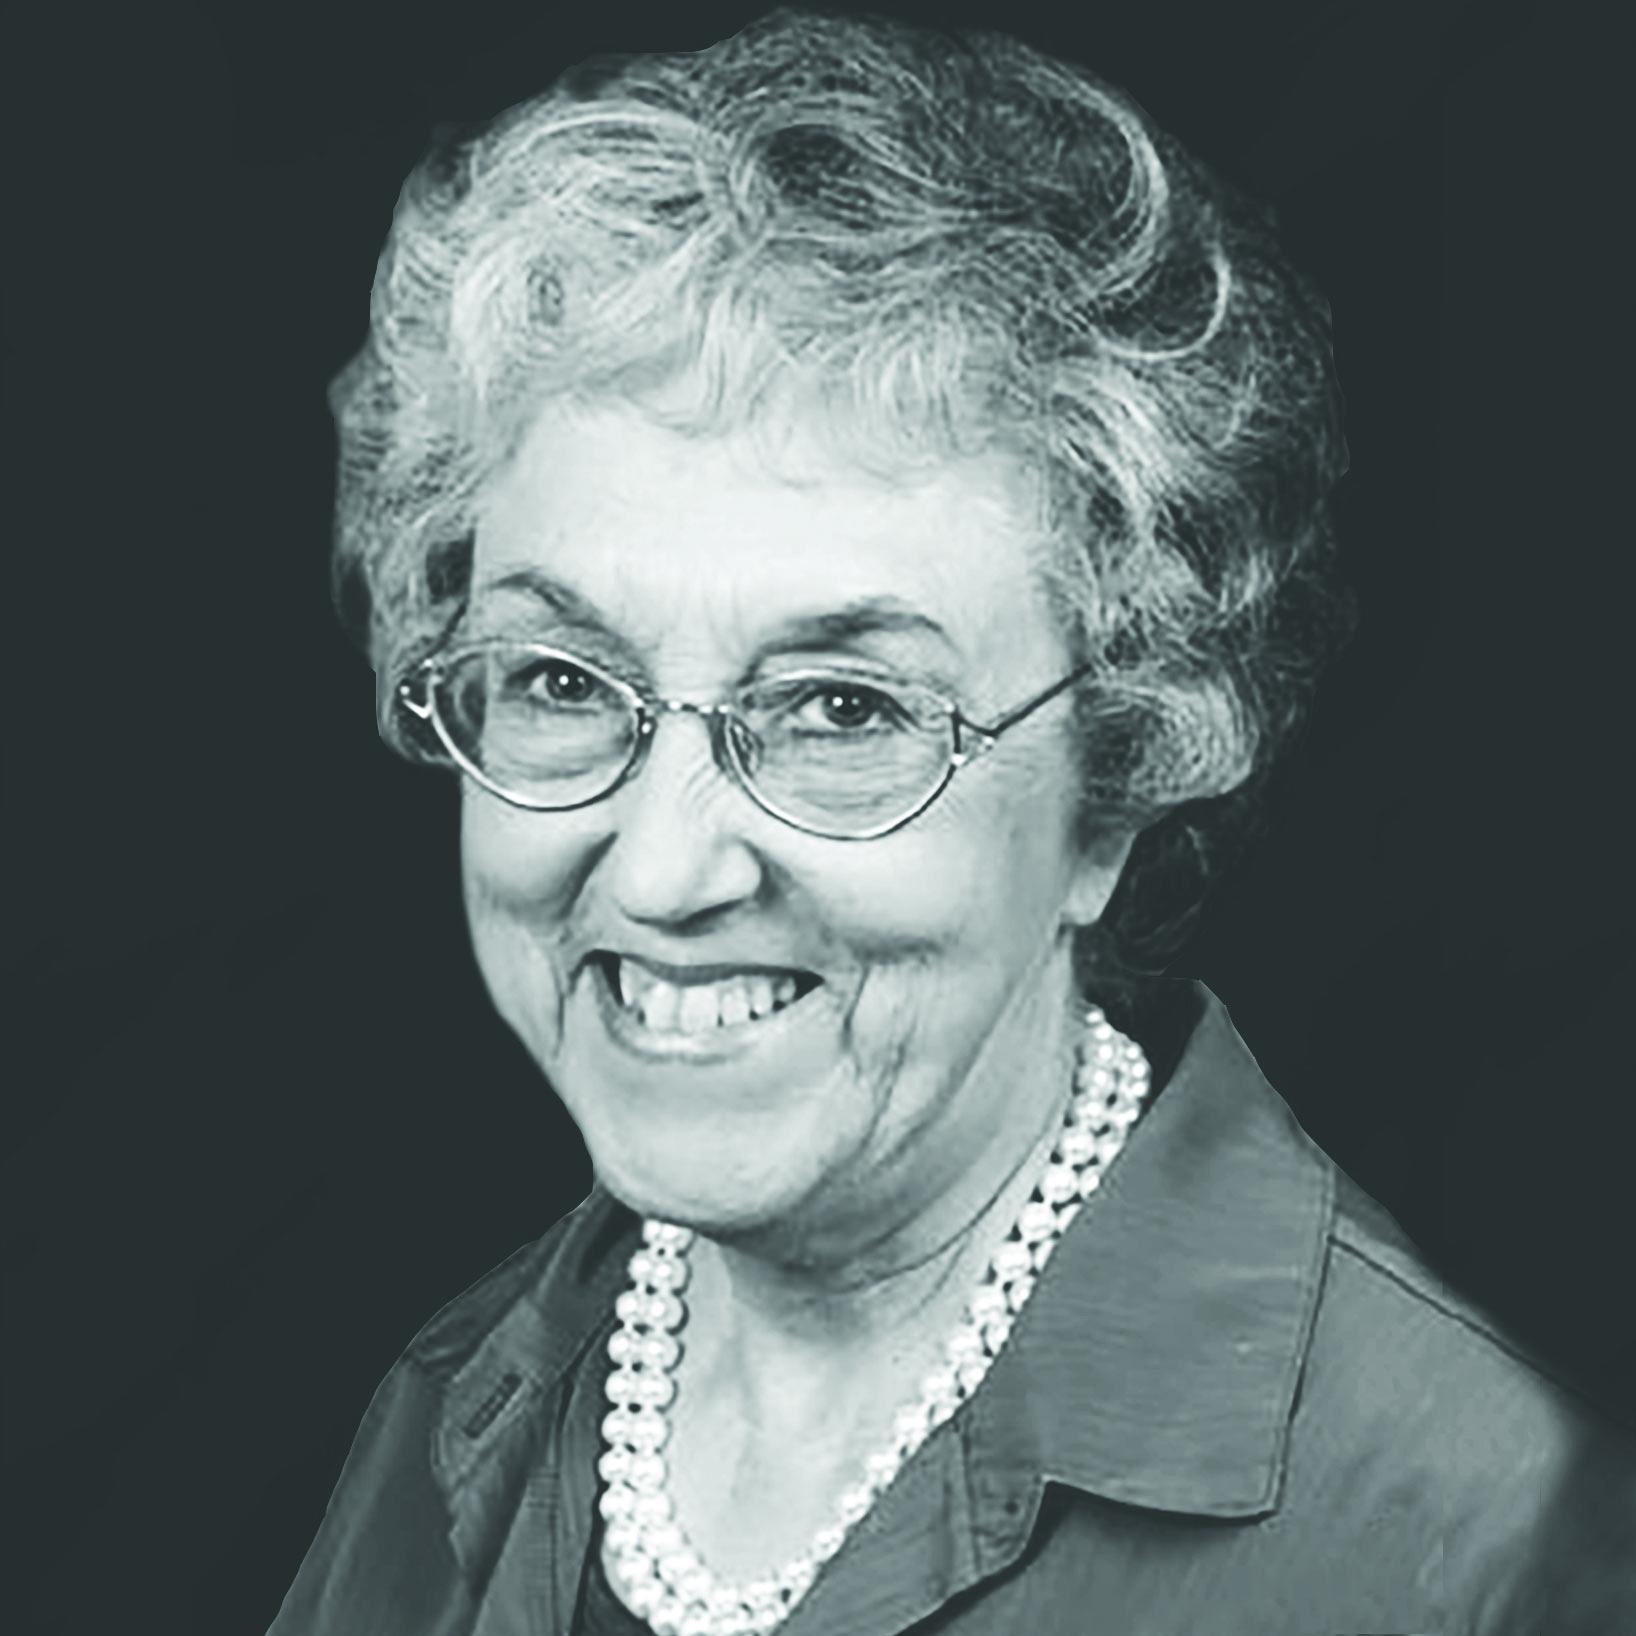 "<a href=""https://christianstandard.com/author/marjoriekrugergordon/"" target=""_self"">Marjorie Gordon</a>"